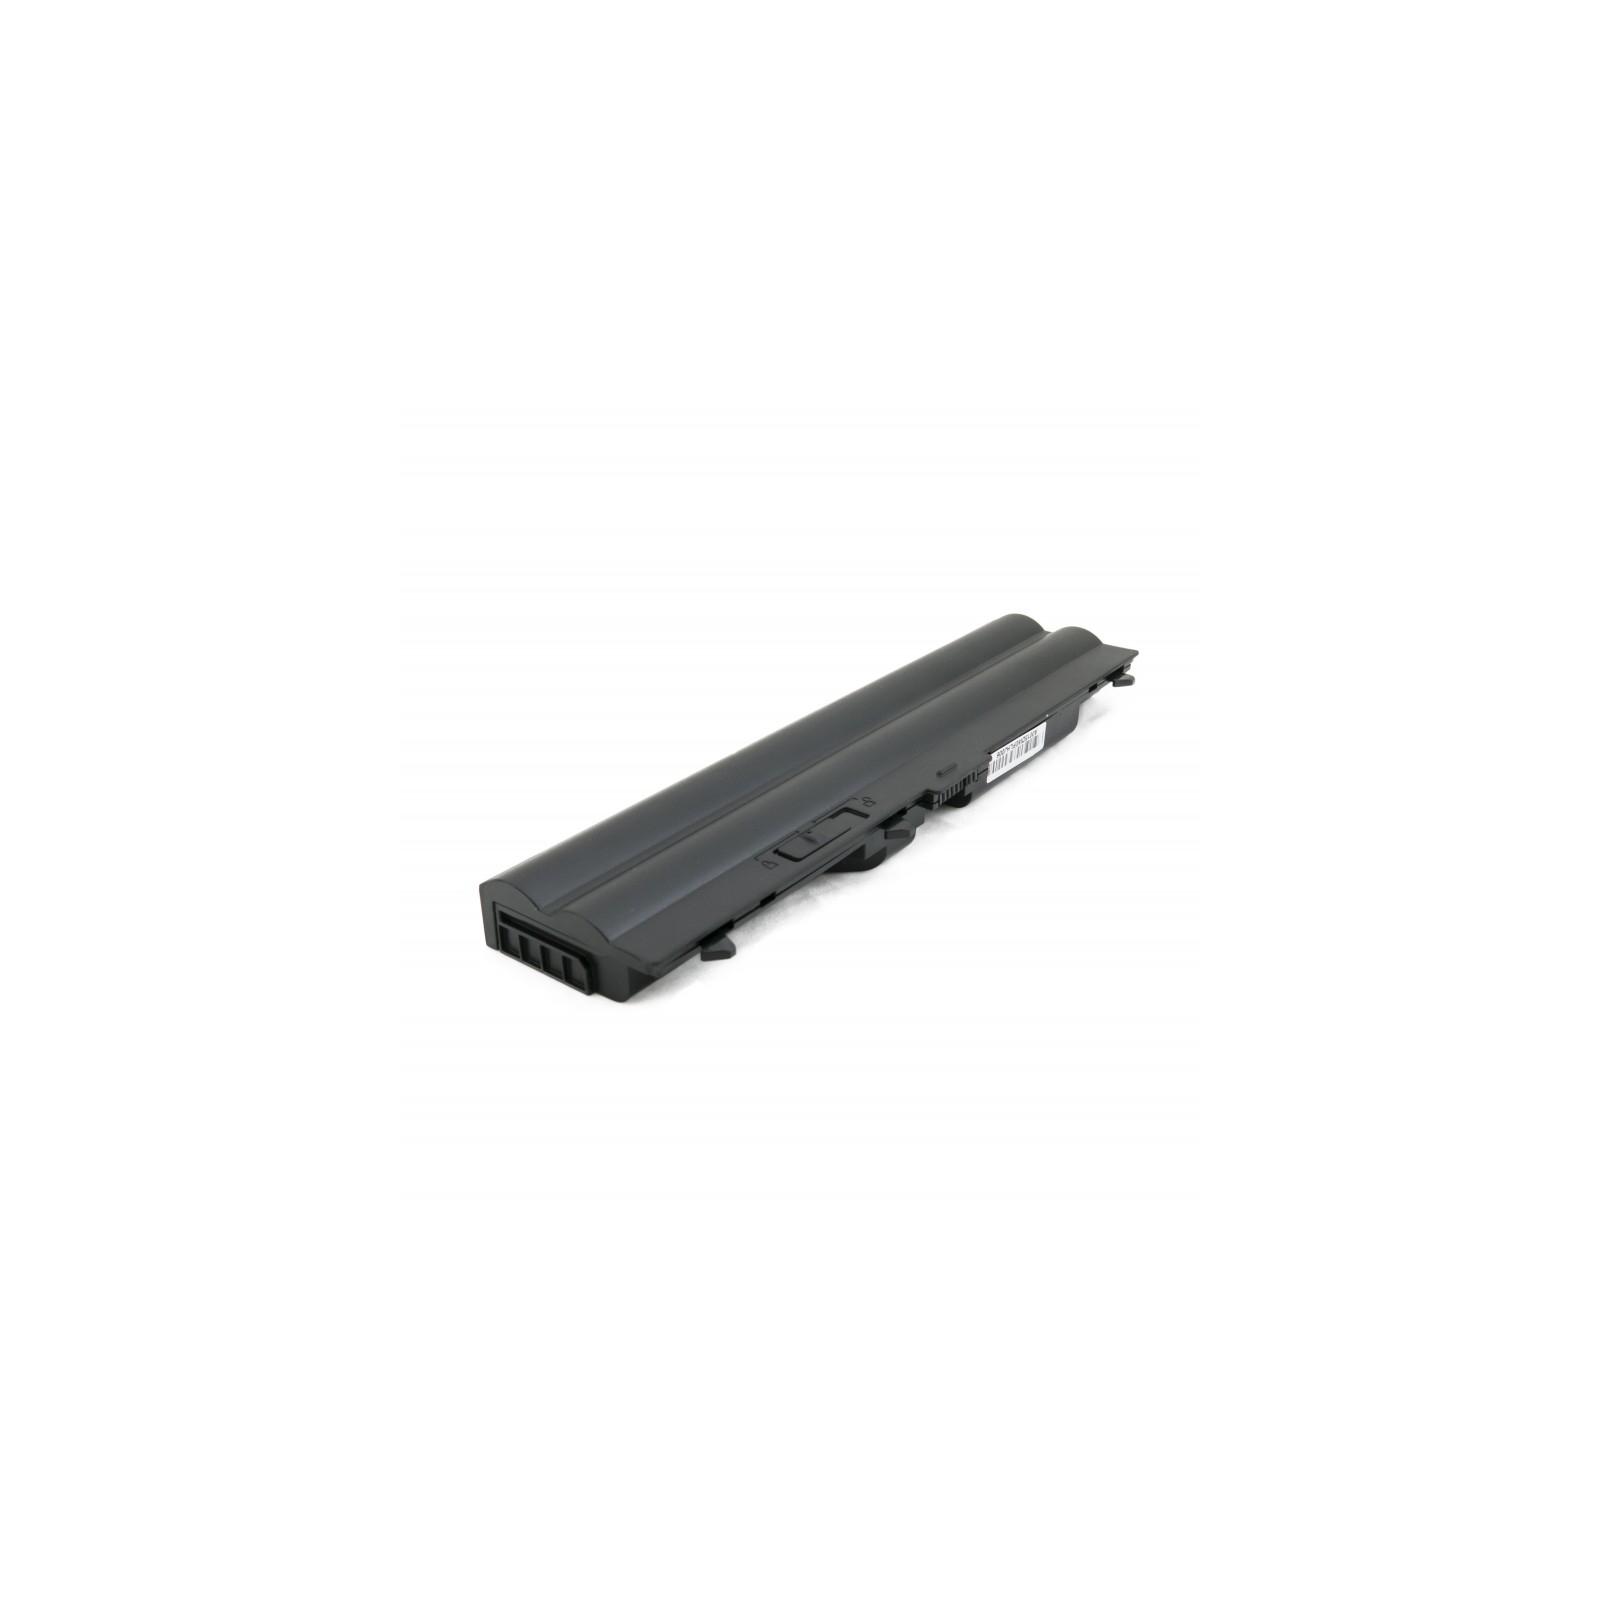 Аккумулятор для ноутбука Lenovo ThinkPad T410, 5200 mAh EXTRADIGITAL (BNL3950) изображение 3